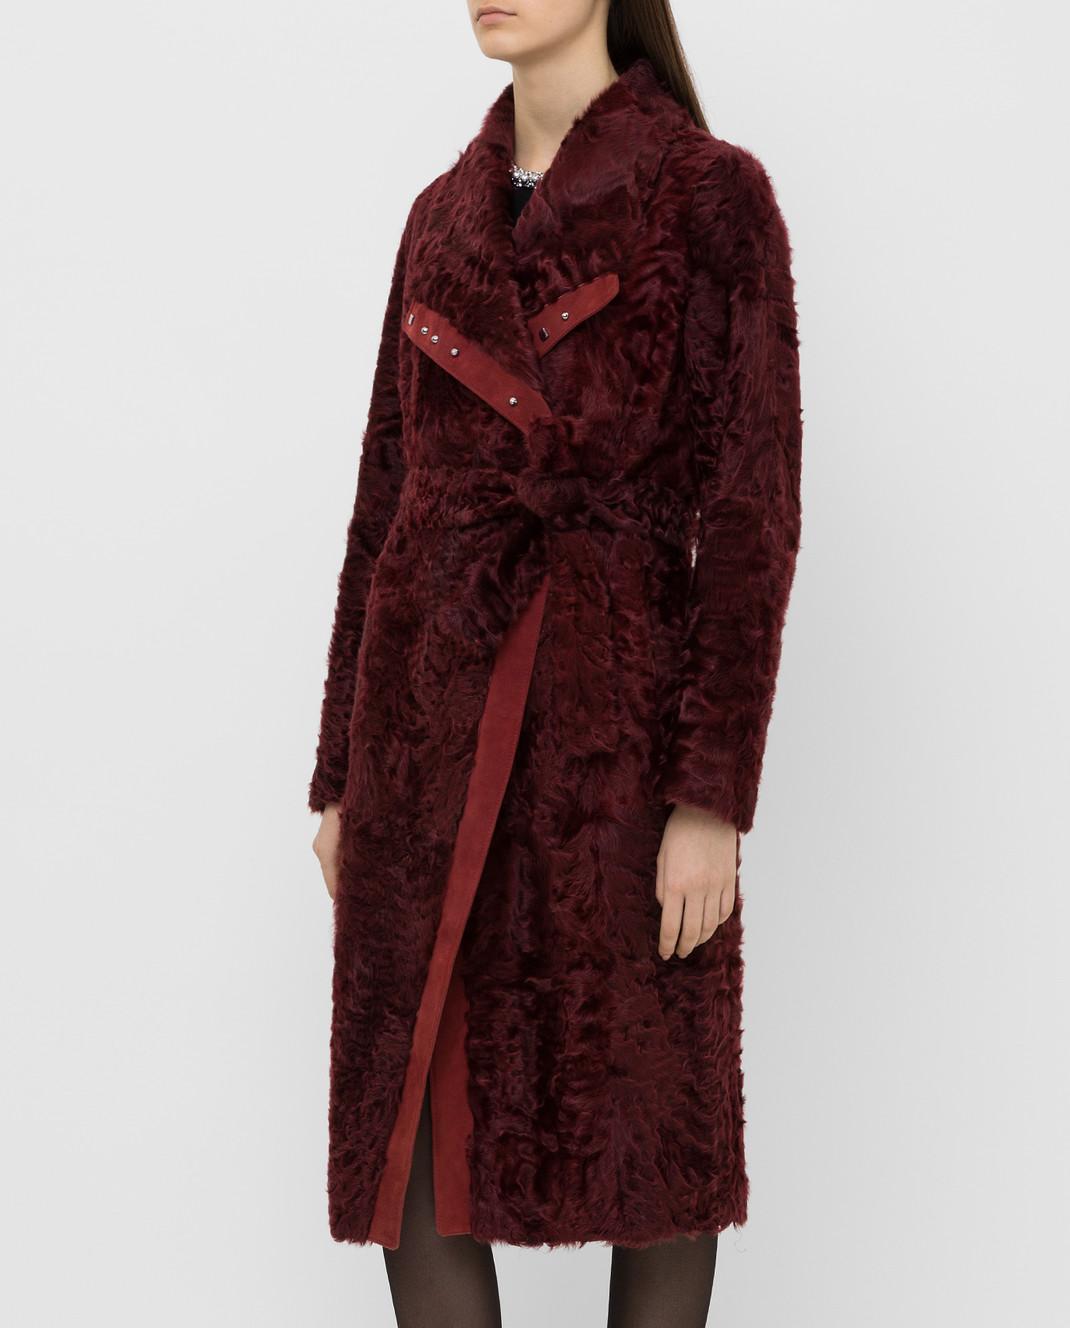 Giuliana Teso Бордовая шуба из меха ягненка 64K6210 изображение 3